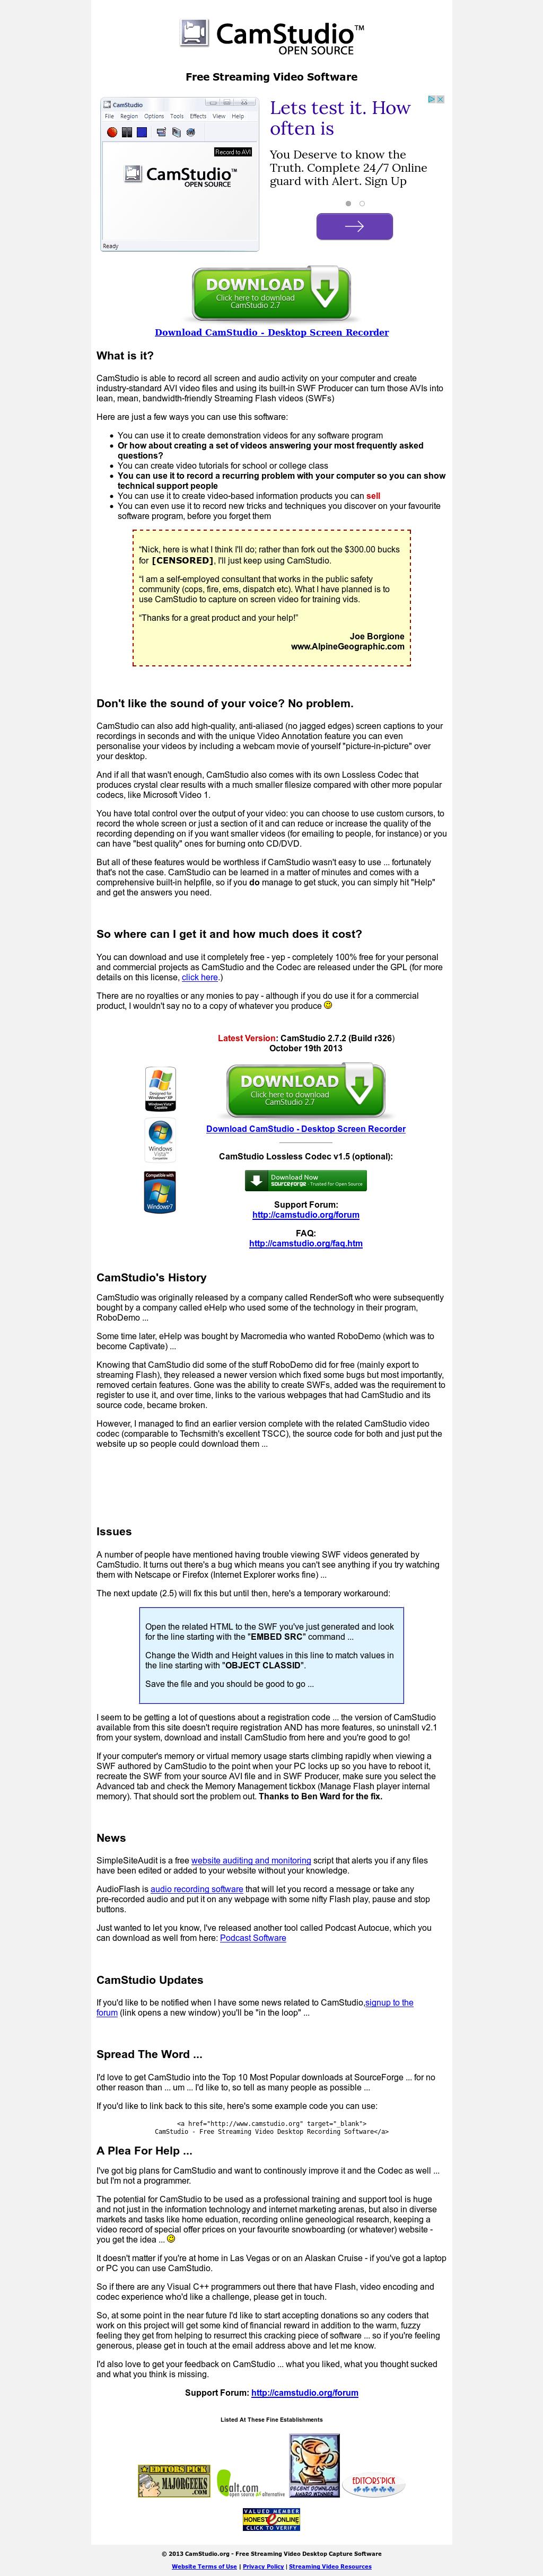 CamStudio Competitors, Revenue and Employees - Owler Company Profile